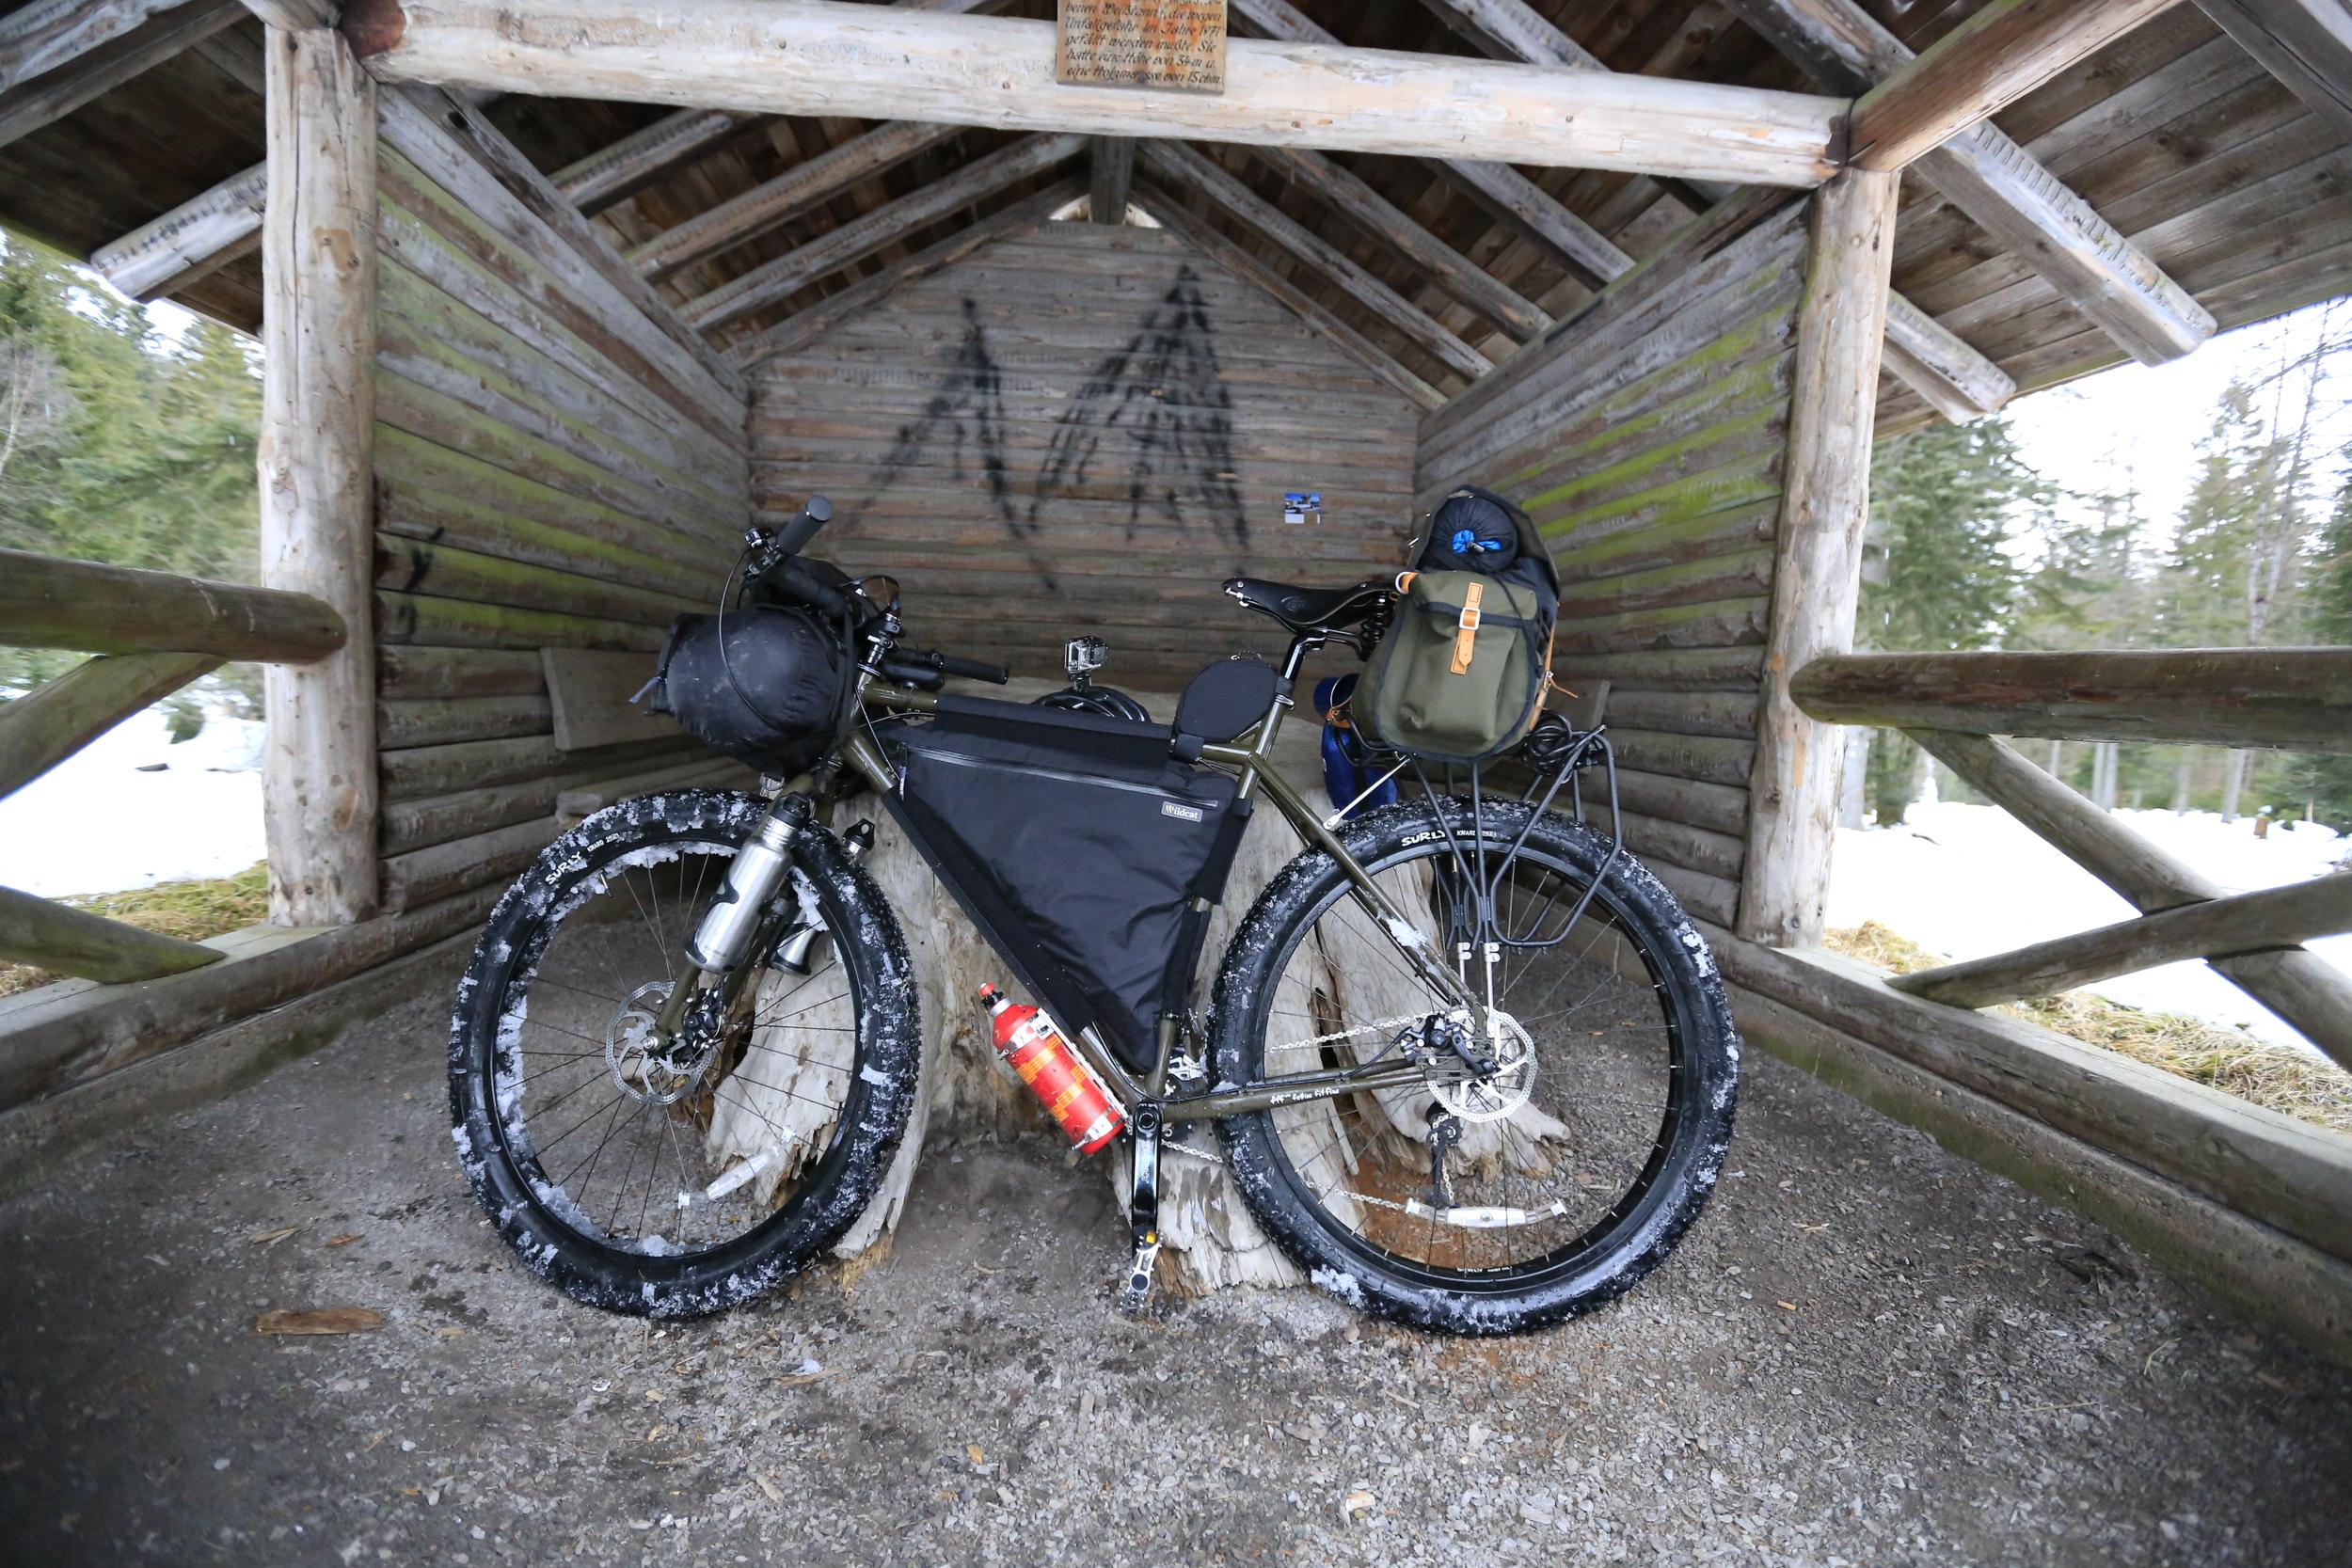 surly, surly ecr, bikepacking blog, wildcat gear, carradice, revelate designs, jerrycan, knards, trangia, jones h bar, brooks, bikepacking blog, cycling blog, bicycle touring apocalypse